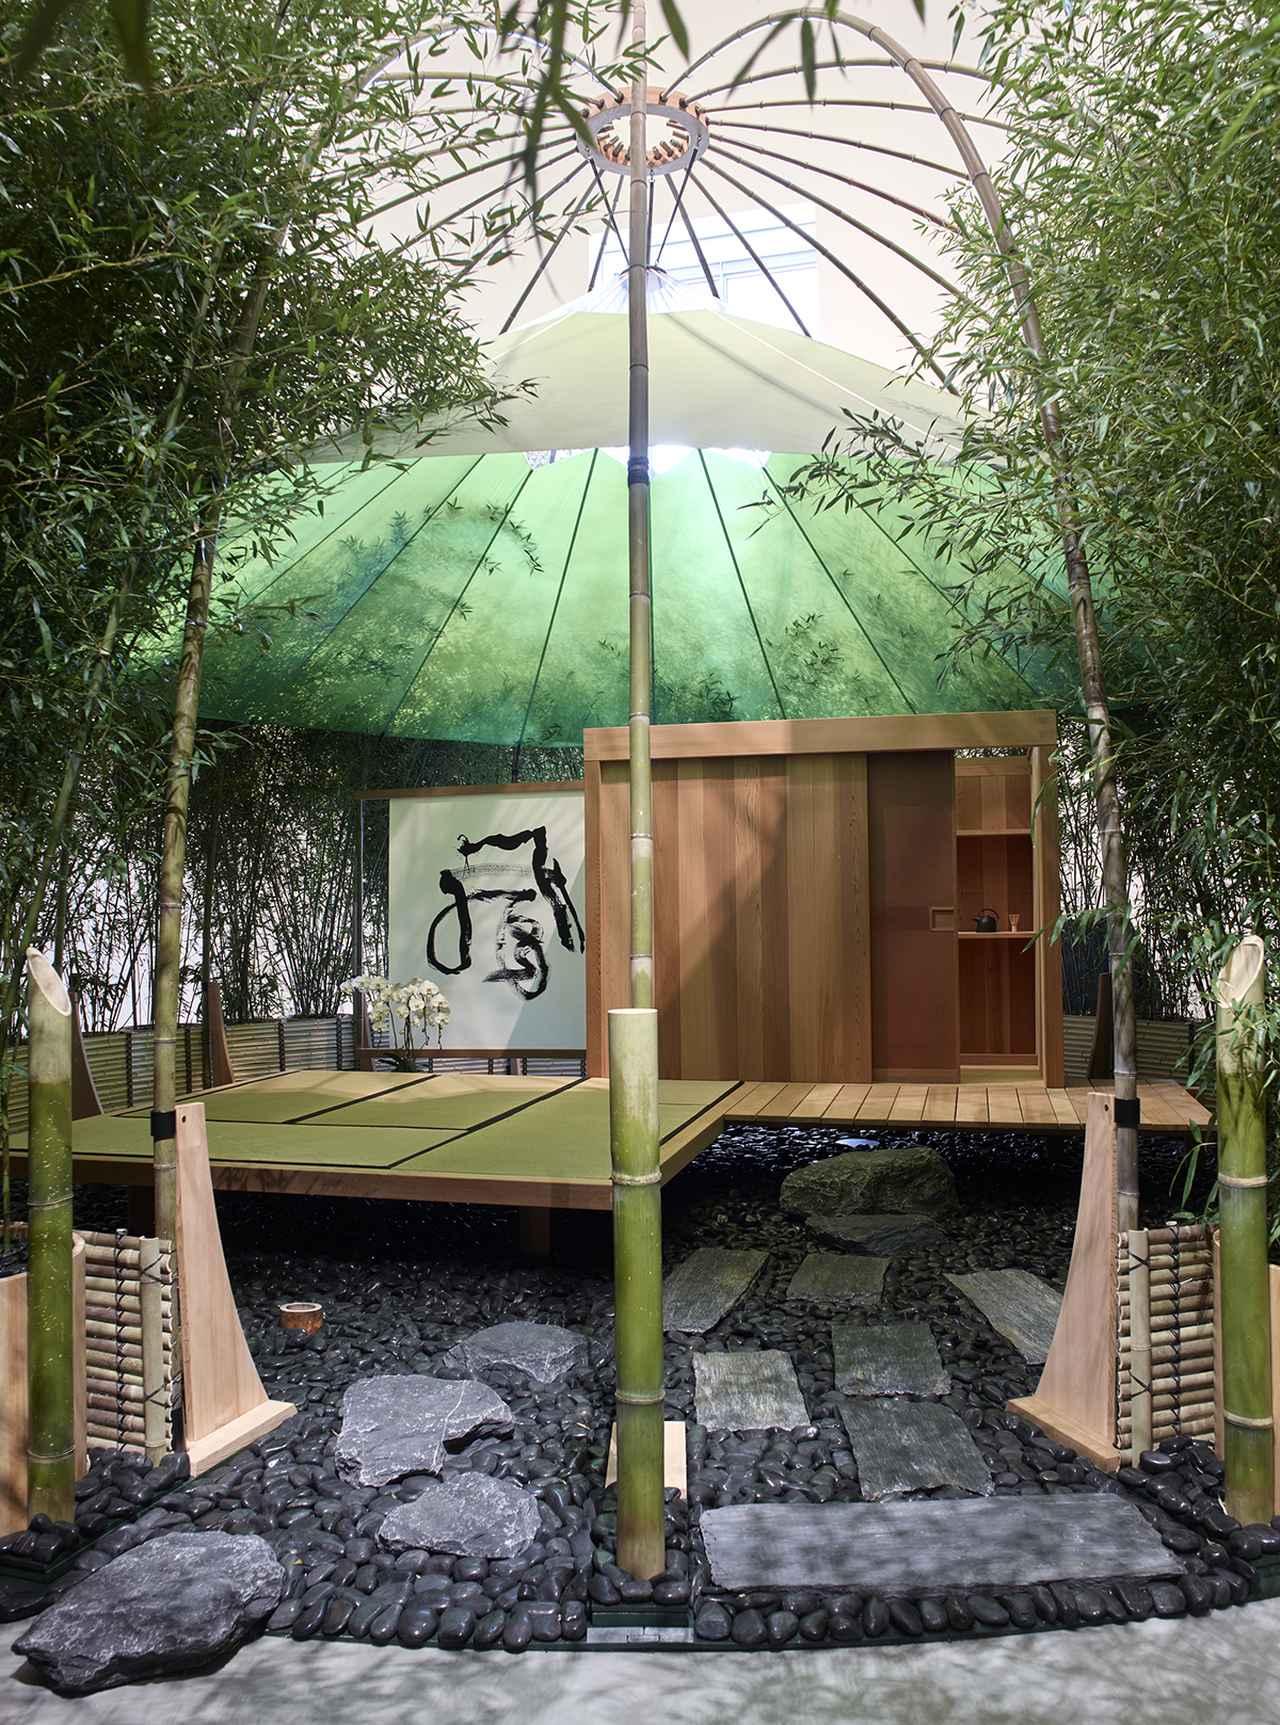 Images : 8番目の画像 - 「シャルロット・ペリアン回顧展で 再発見する日本との深い繫り」のアルバム - T JAPAN:The New York Times Style Magazine 公式サイト